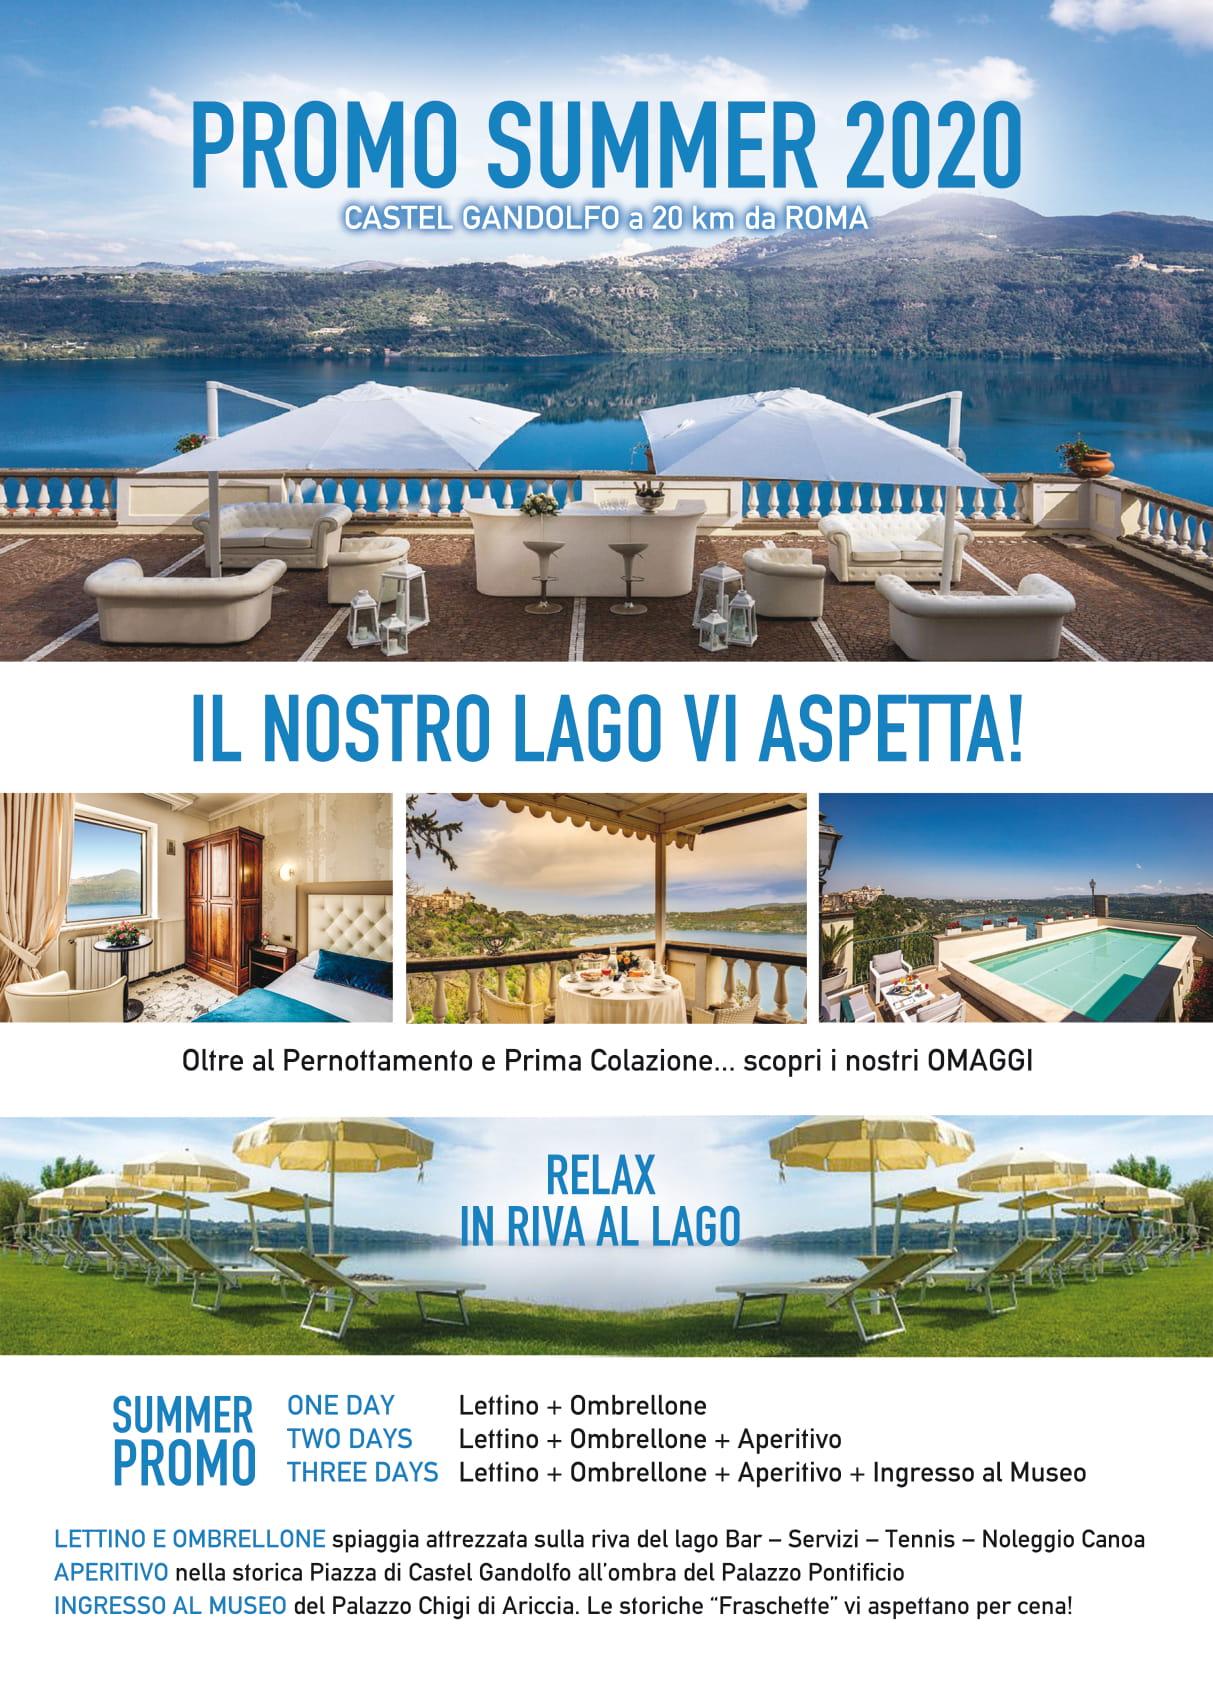 hotel-castel-vecchio-promo-summer-2020